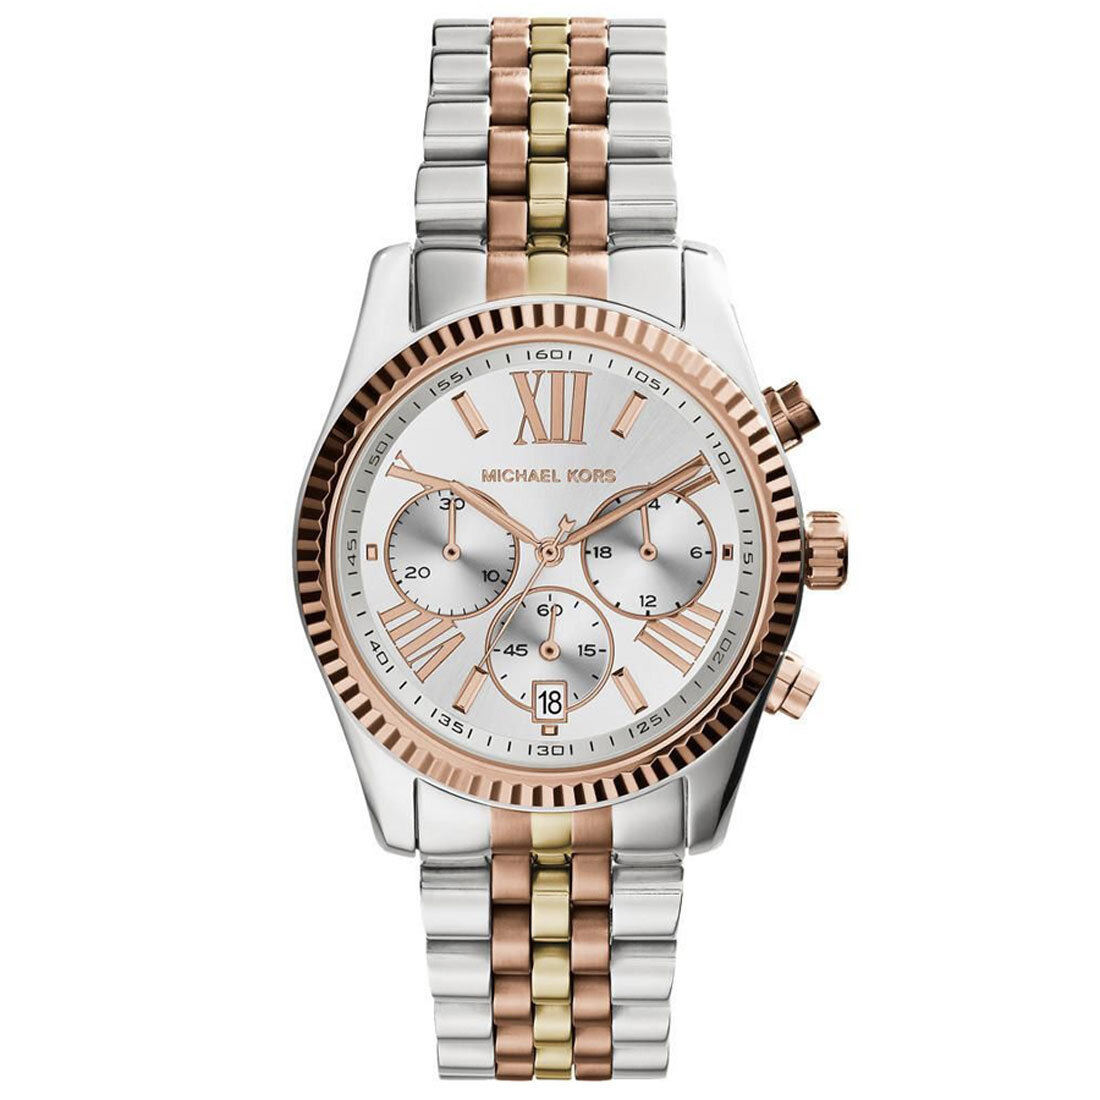 3745736dad2a5 Michael Kors Saat ve Takı & Aksesuar Modelleri - Saat ve Saat